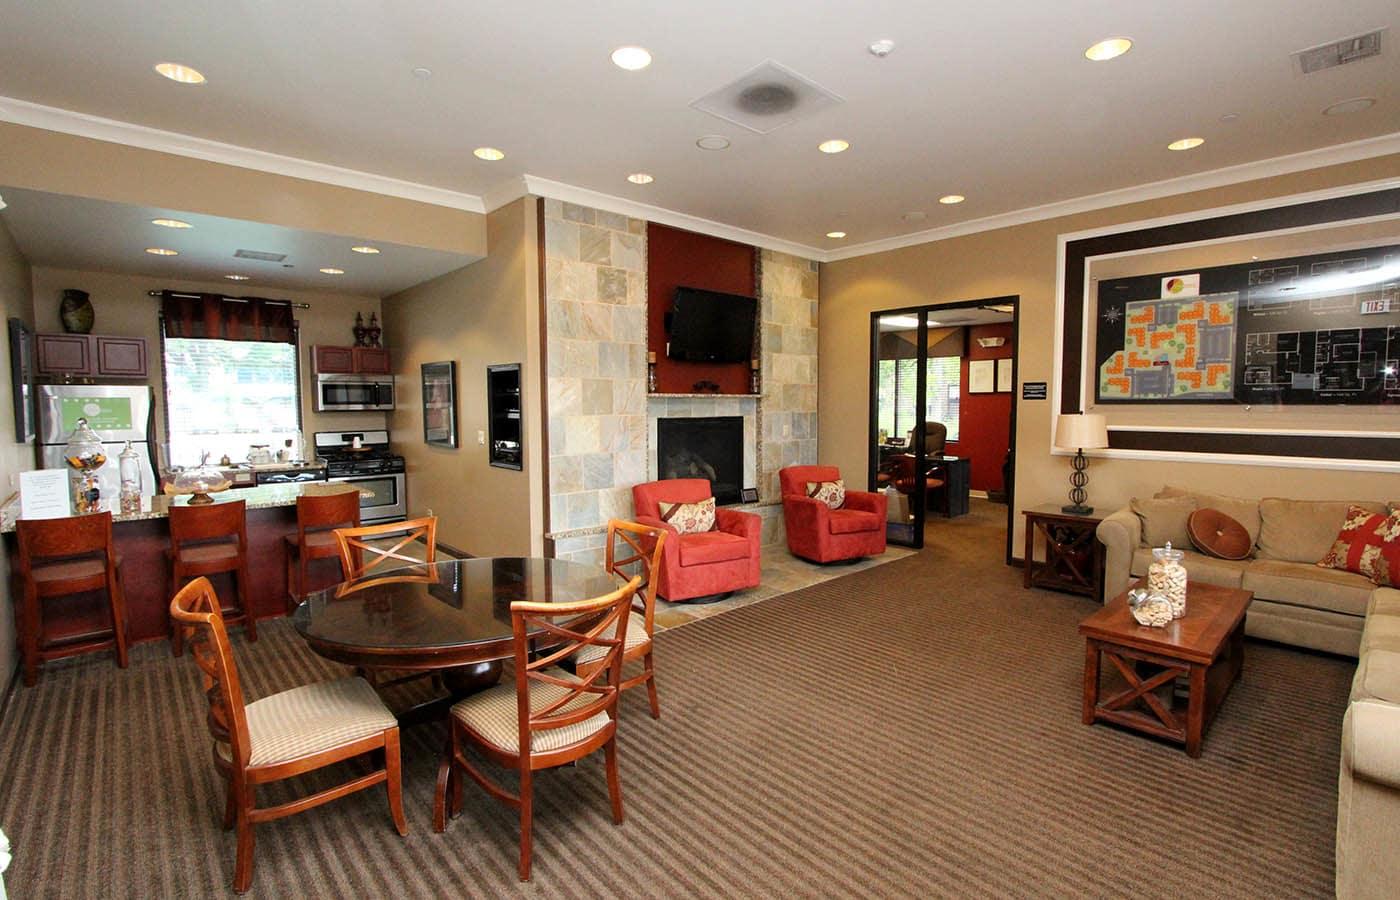 The Living Room Schaumburg - Living Room Ideas